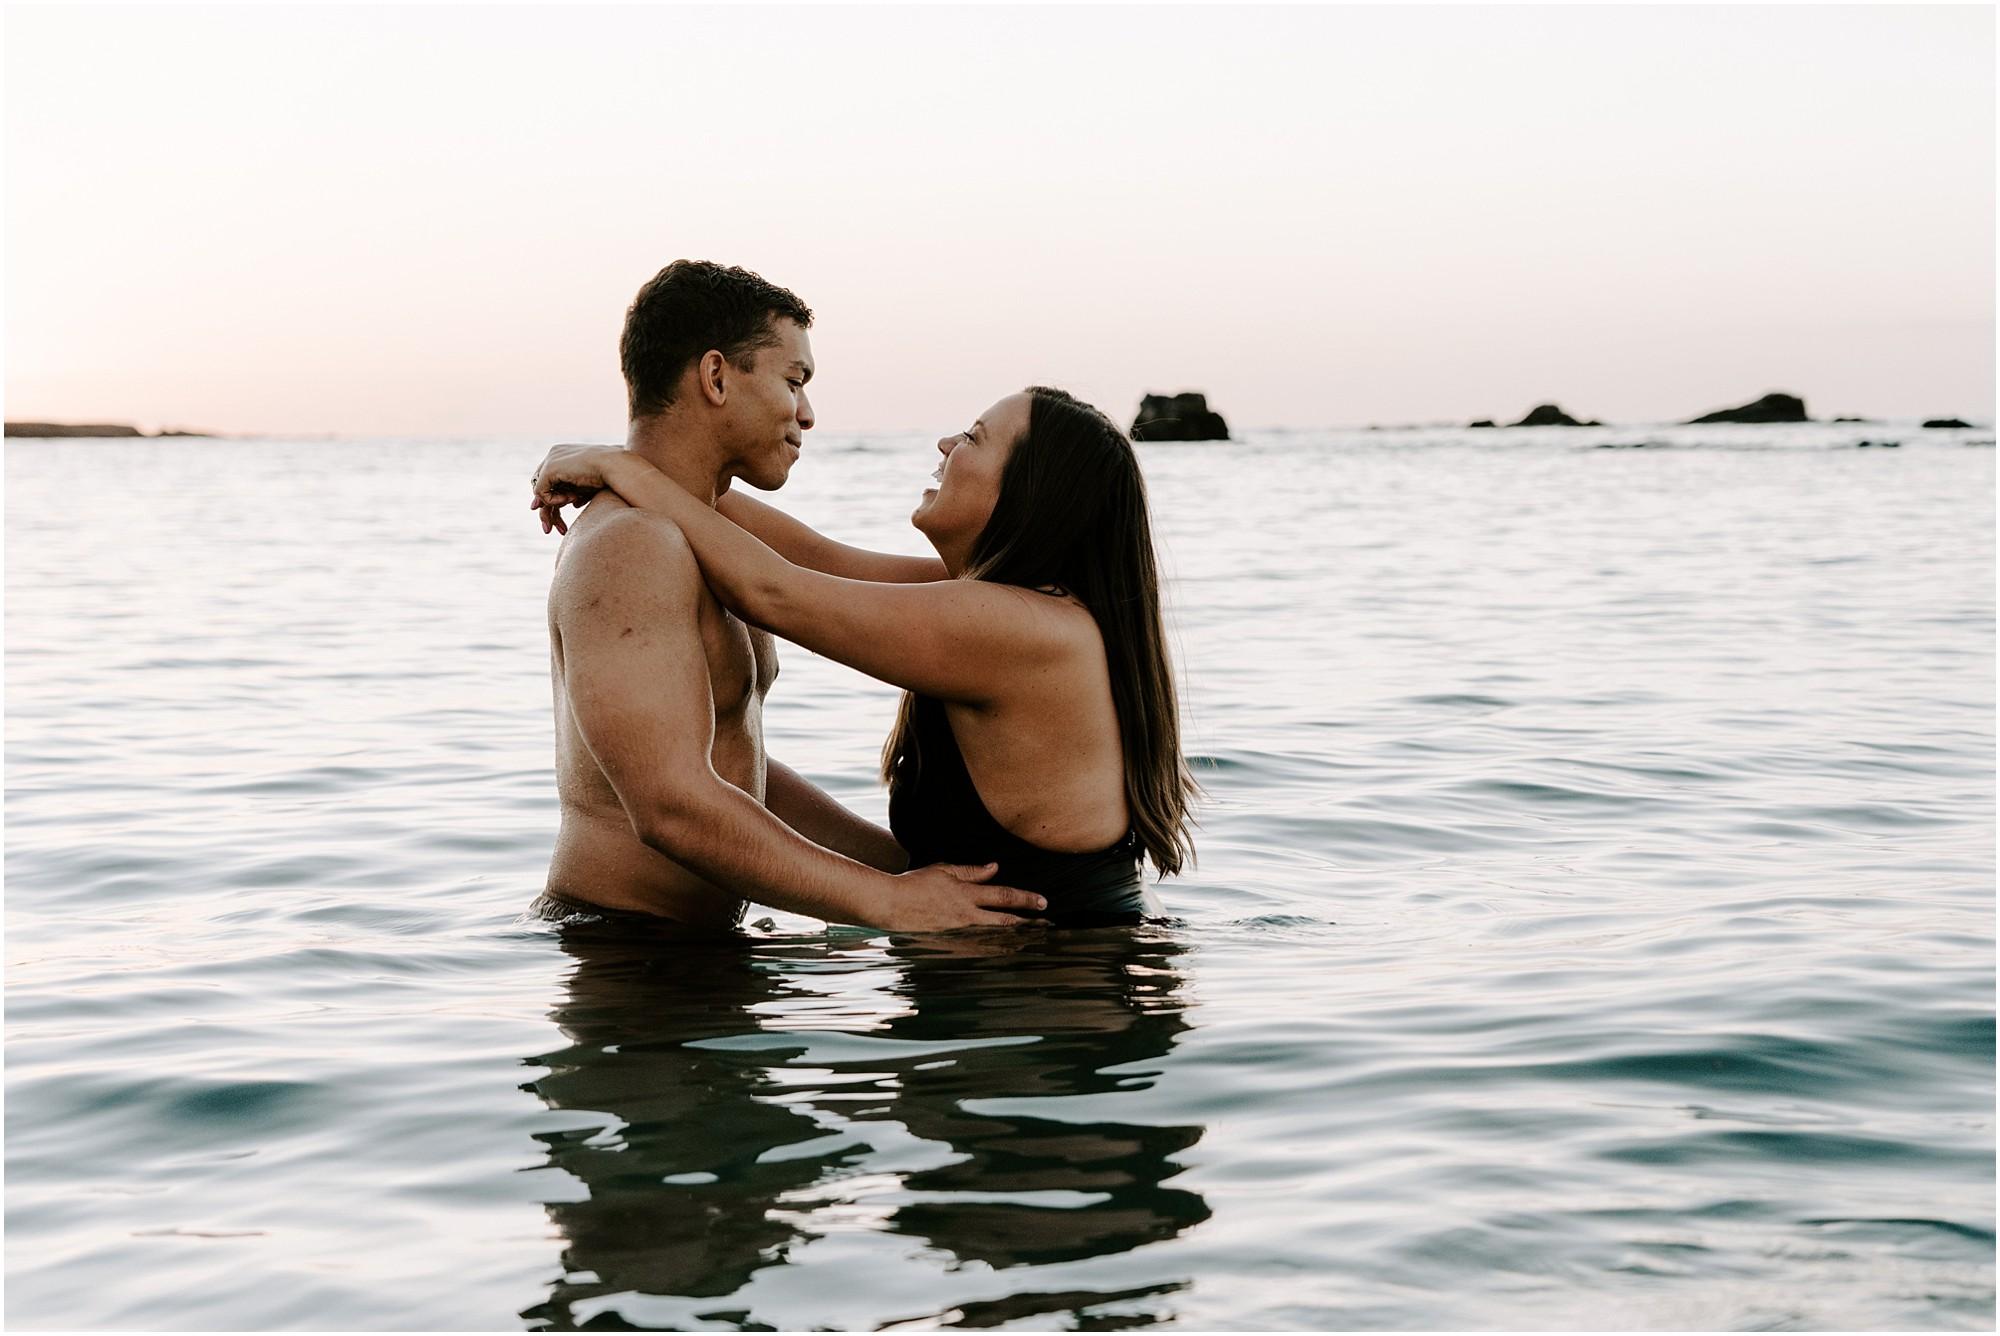 hawaii-couples-engagement-shoot-big-island-elopement-photographer_0022.jpg